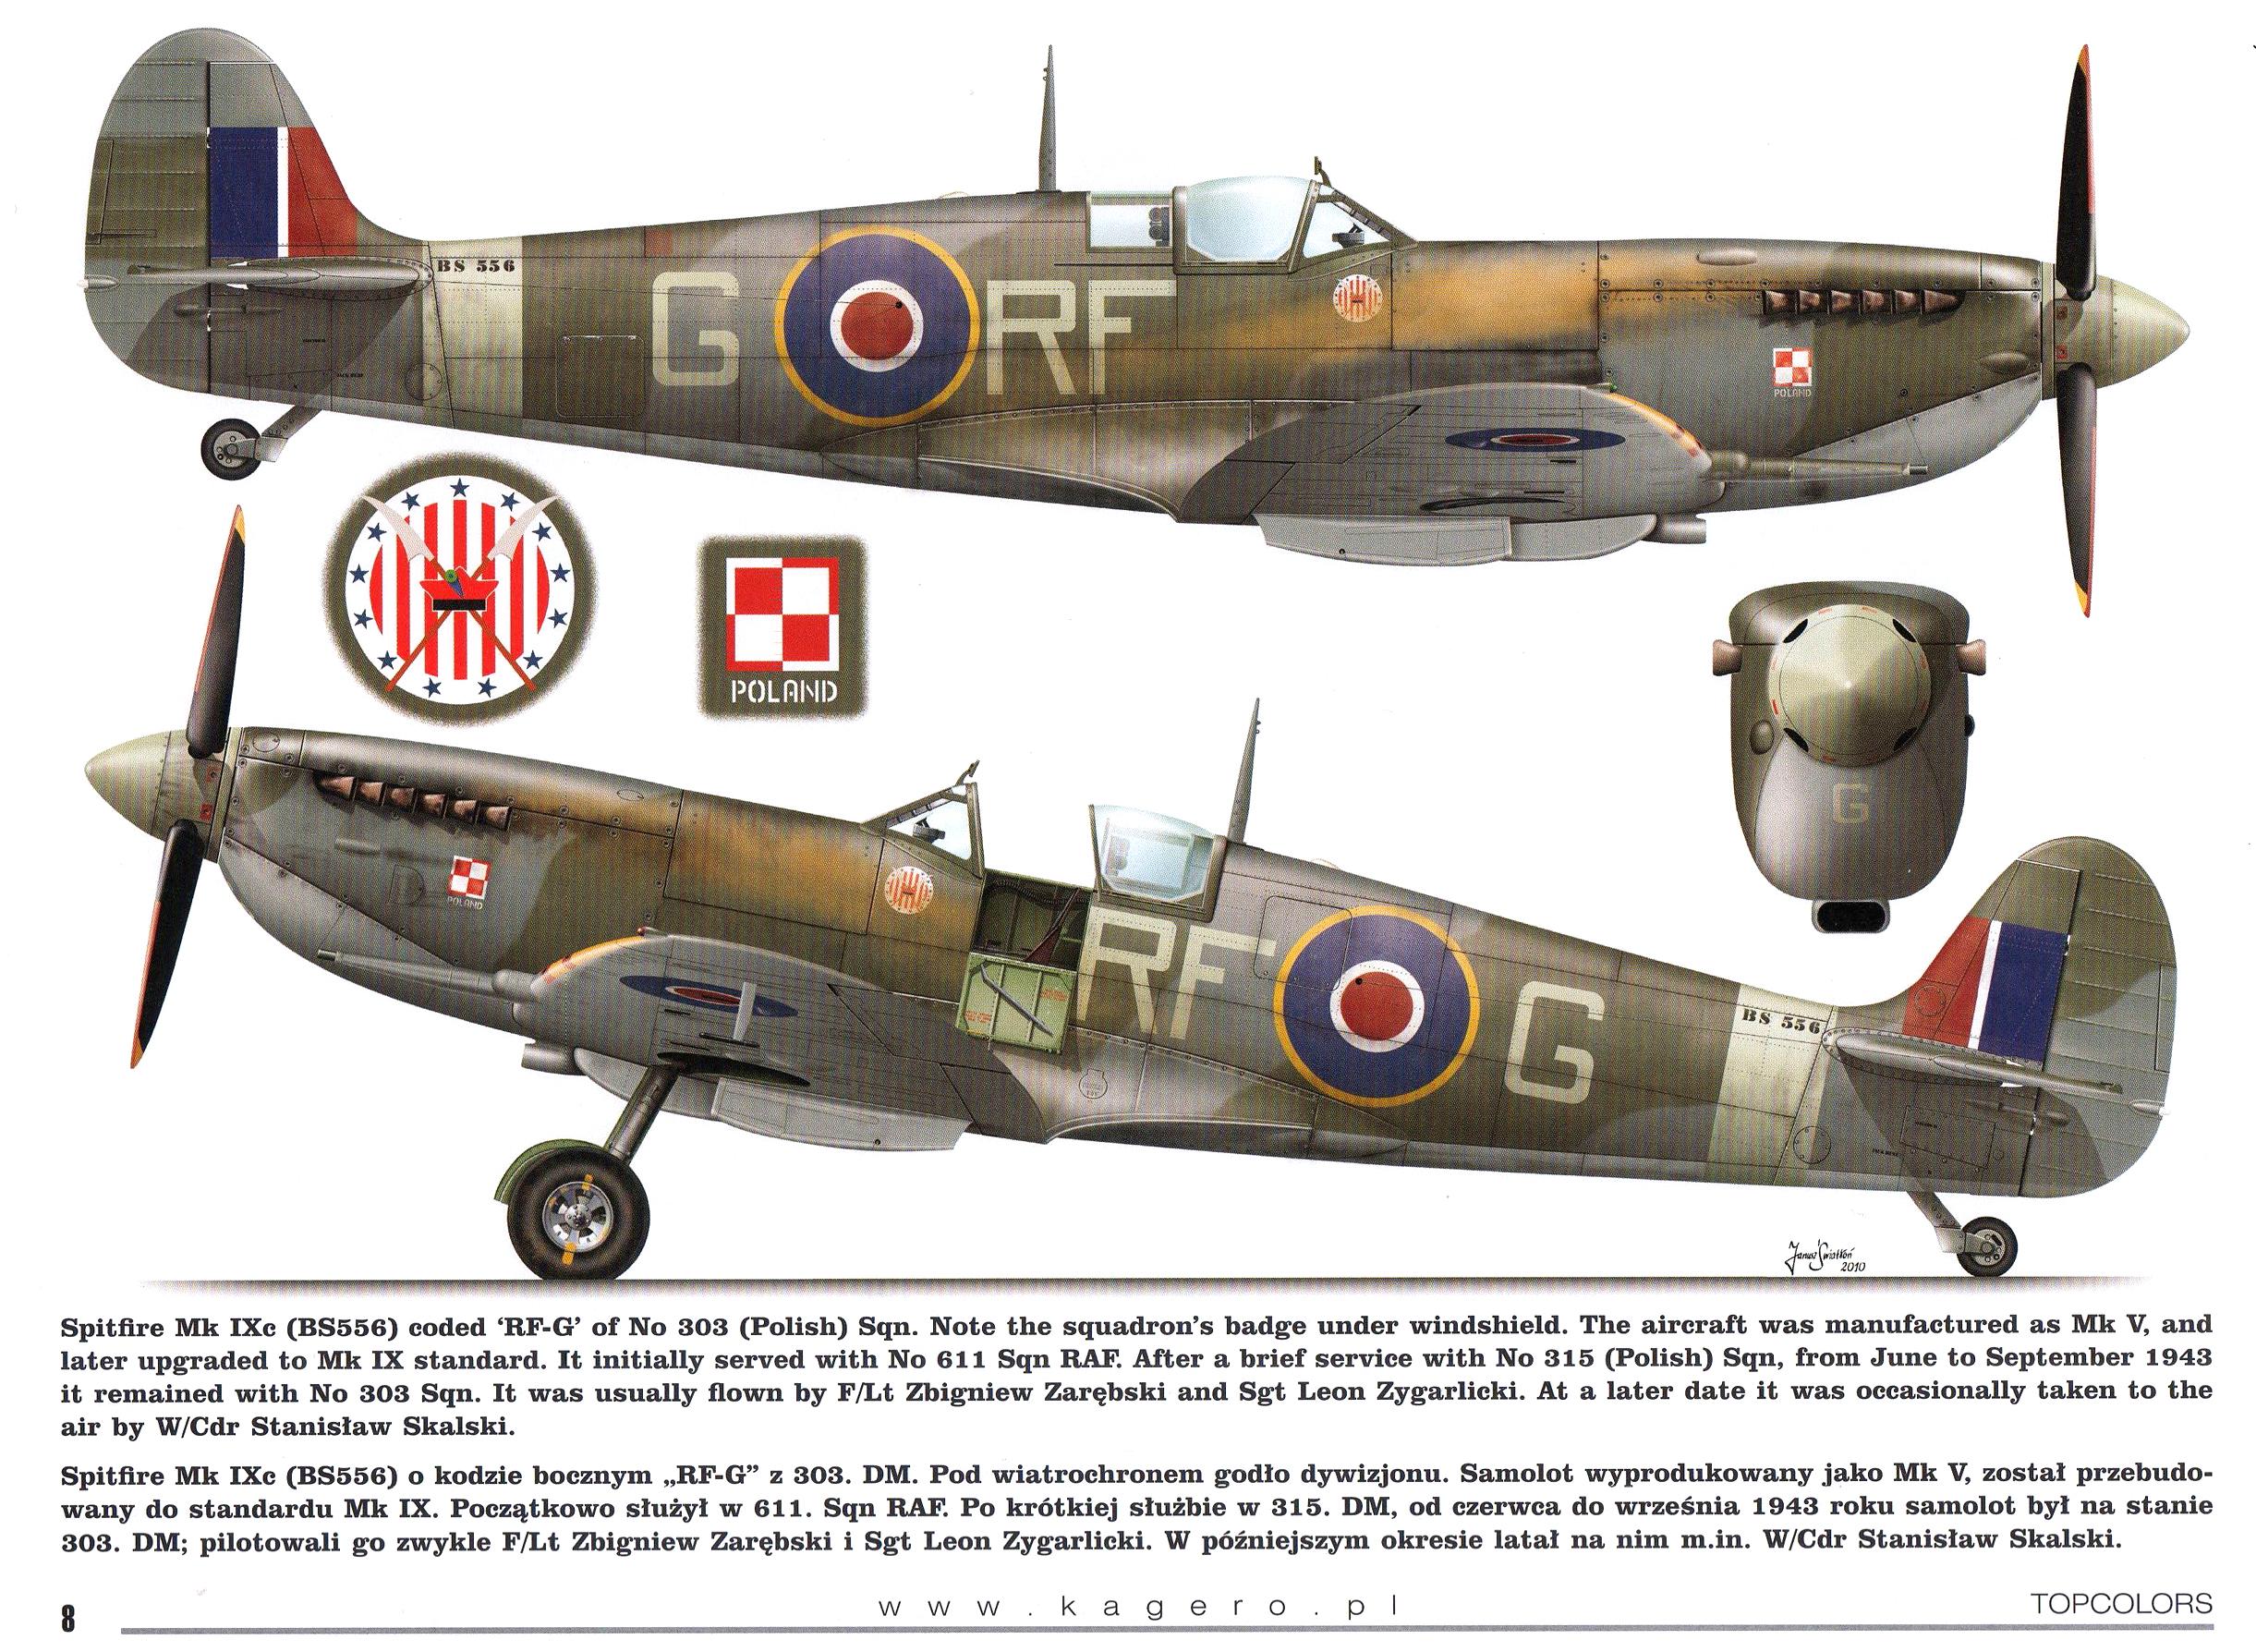 Spitfire MkIXc RAF 303 Polish RFG BS556 TC15015 Supermarine Spitfire MkIX Page 08